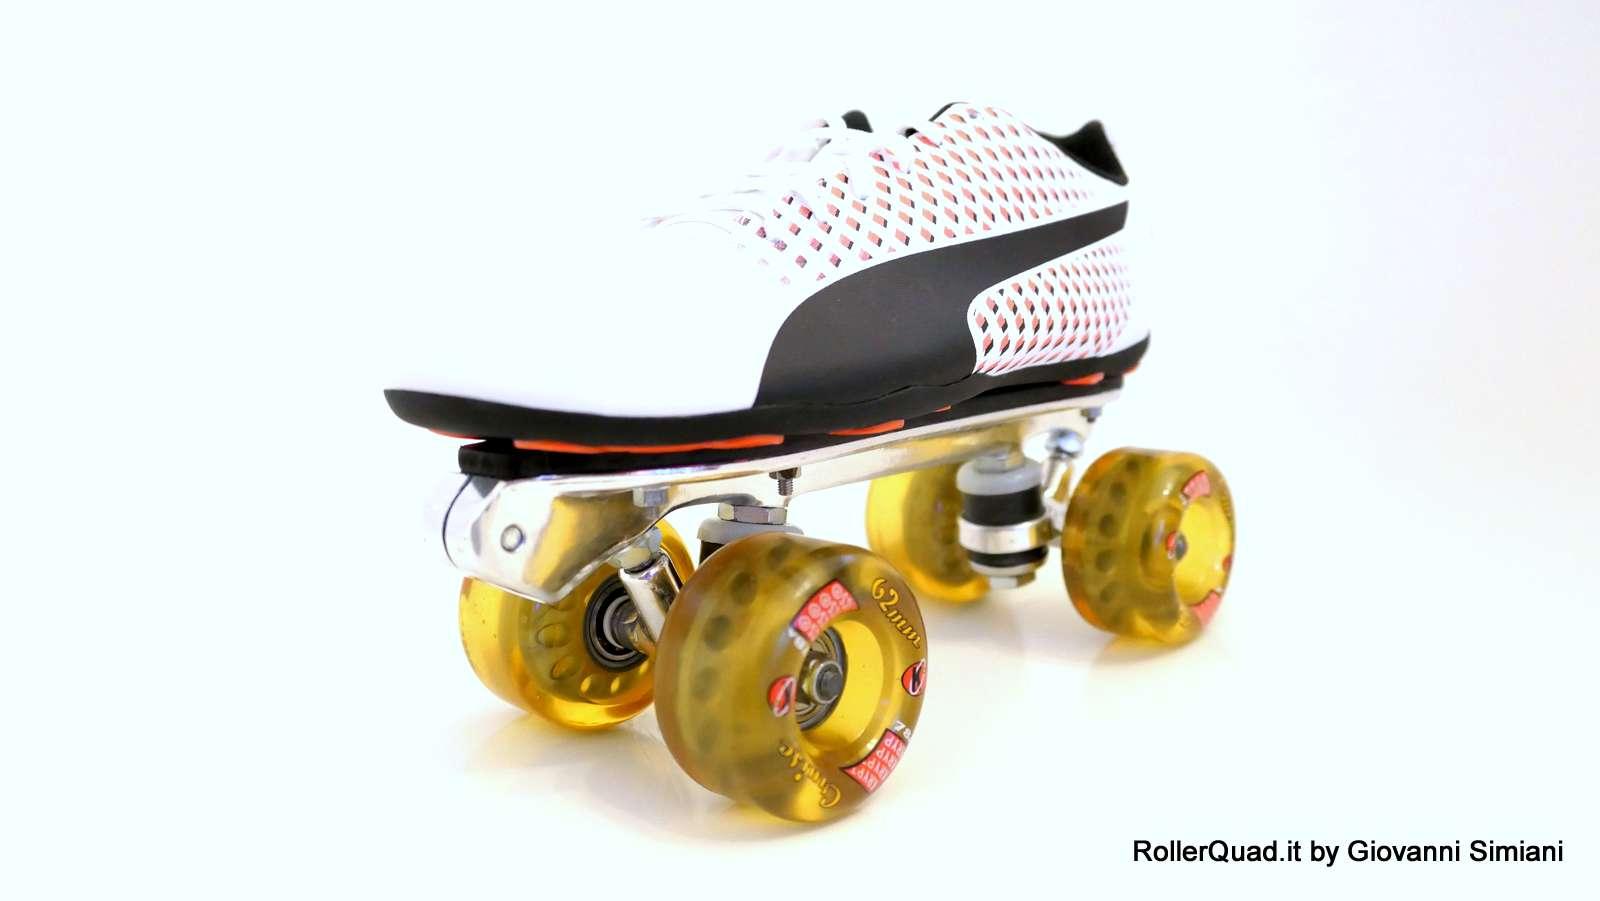 02-rollerquad_it_Giovanni_Simiani